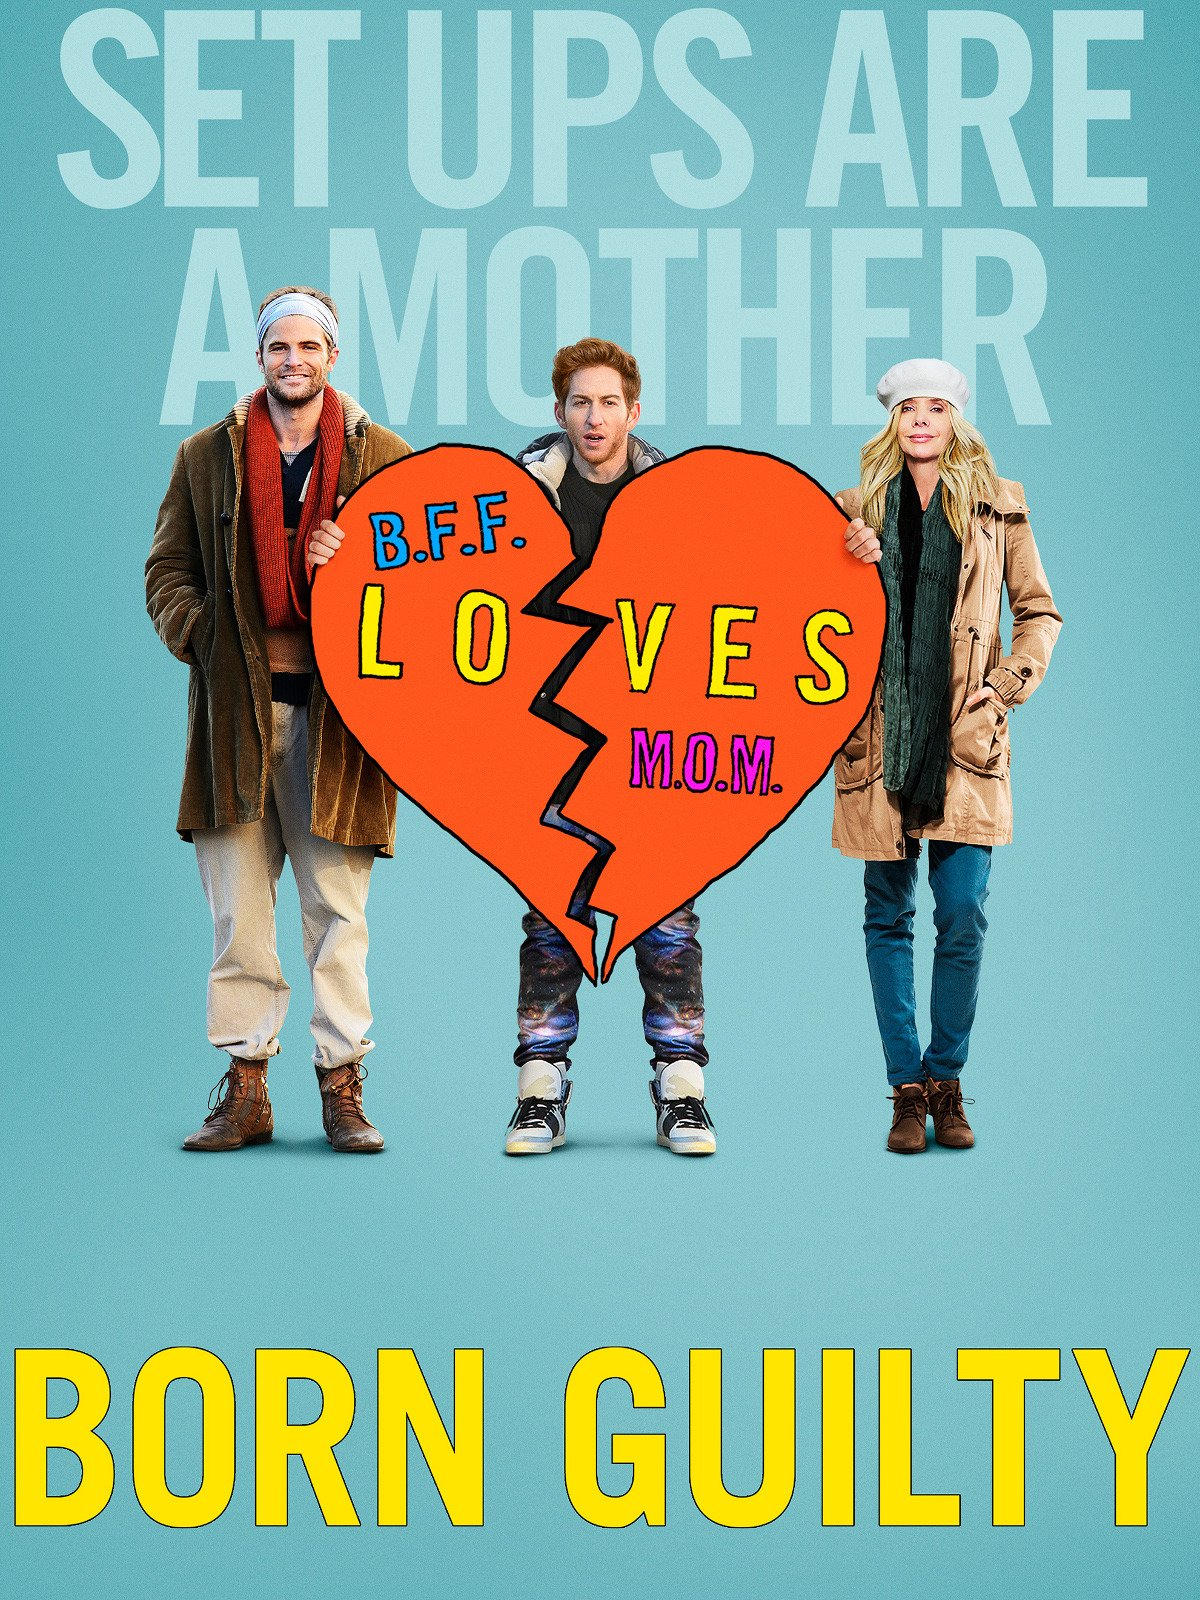 Amazon.com: Born Guilty: Rosanna Arquette, Jay Devore, David Cousins ...